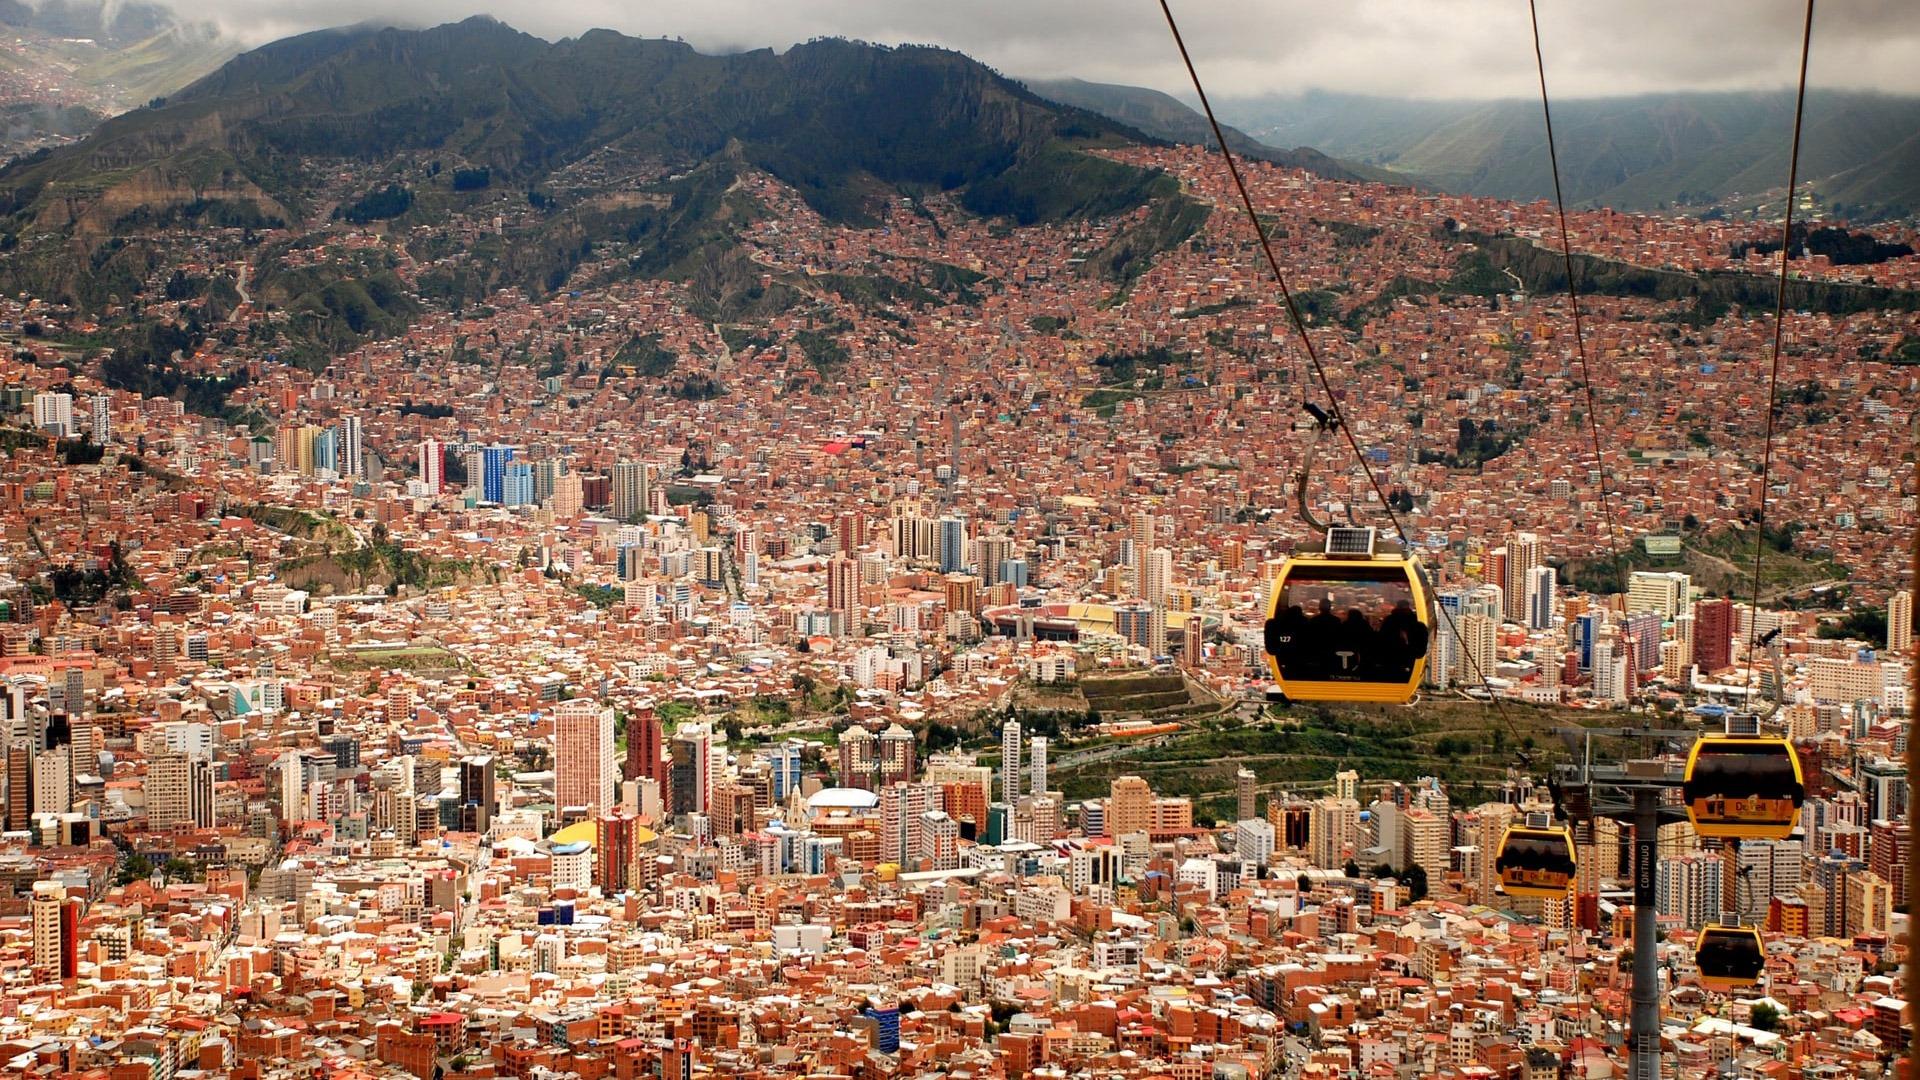 Teleferico cable car system above the city of La Paz, Bolivia